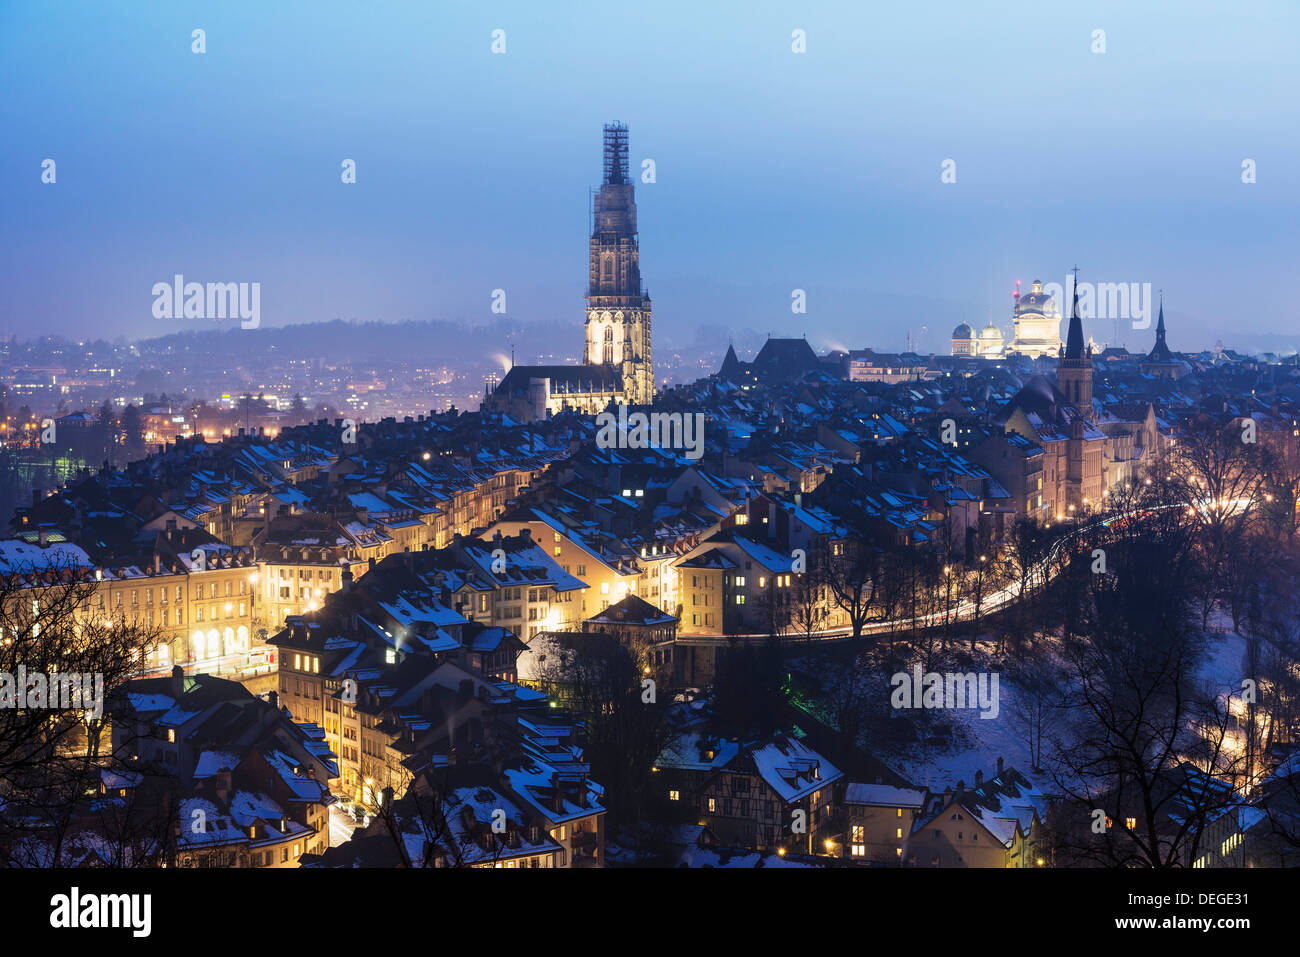 City View, Bern, Schweiz, Europa Stockbild